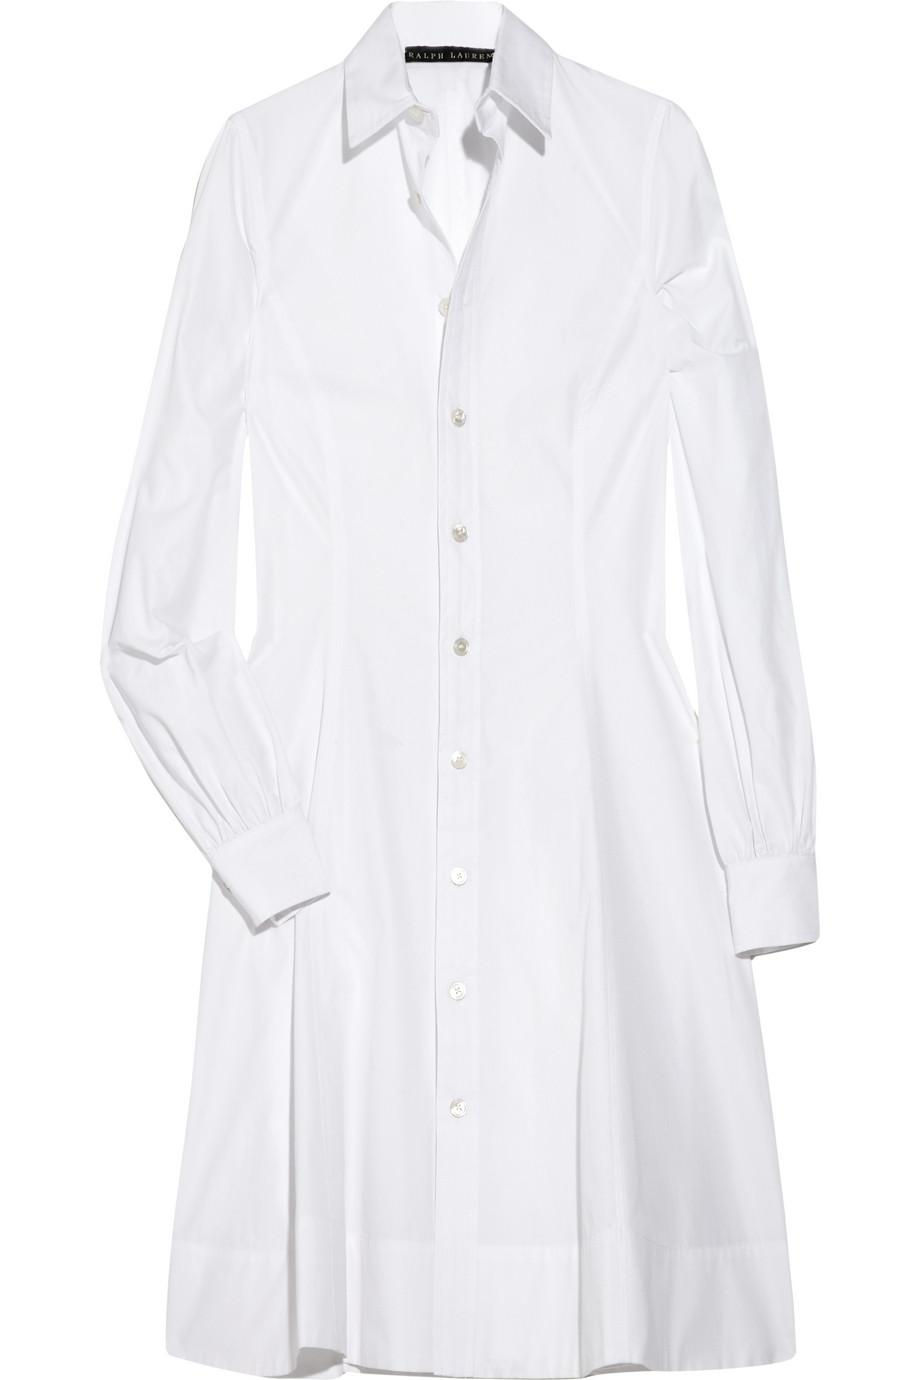 d382faf858 Ralph Lauren Black Label Hilda Cotton Shirt Dress in White - Lyst